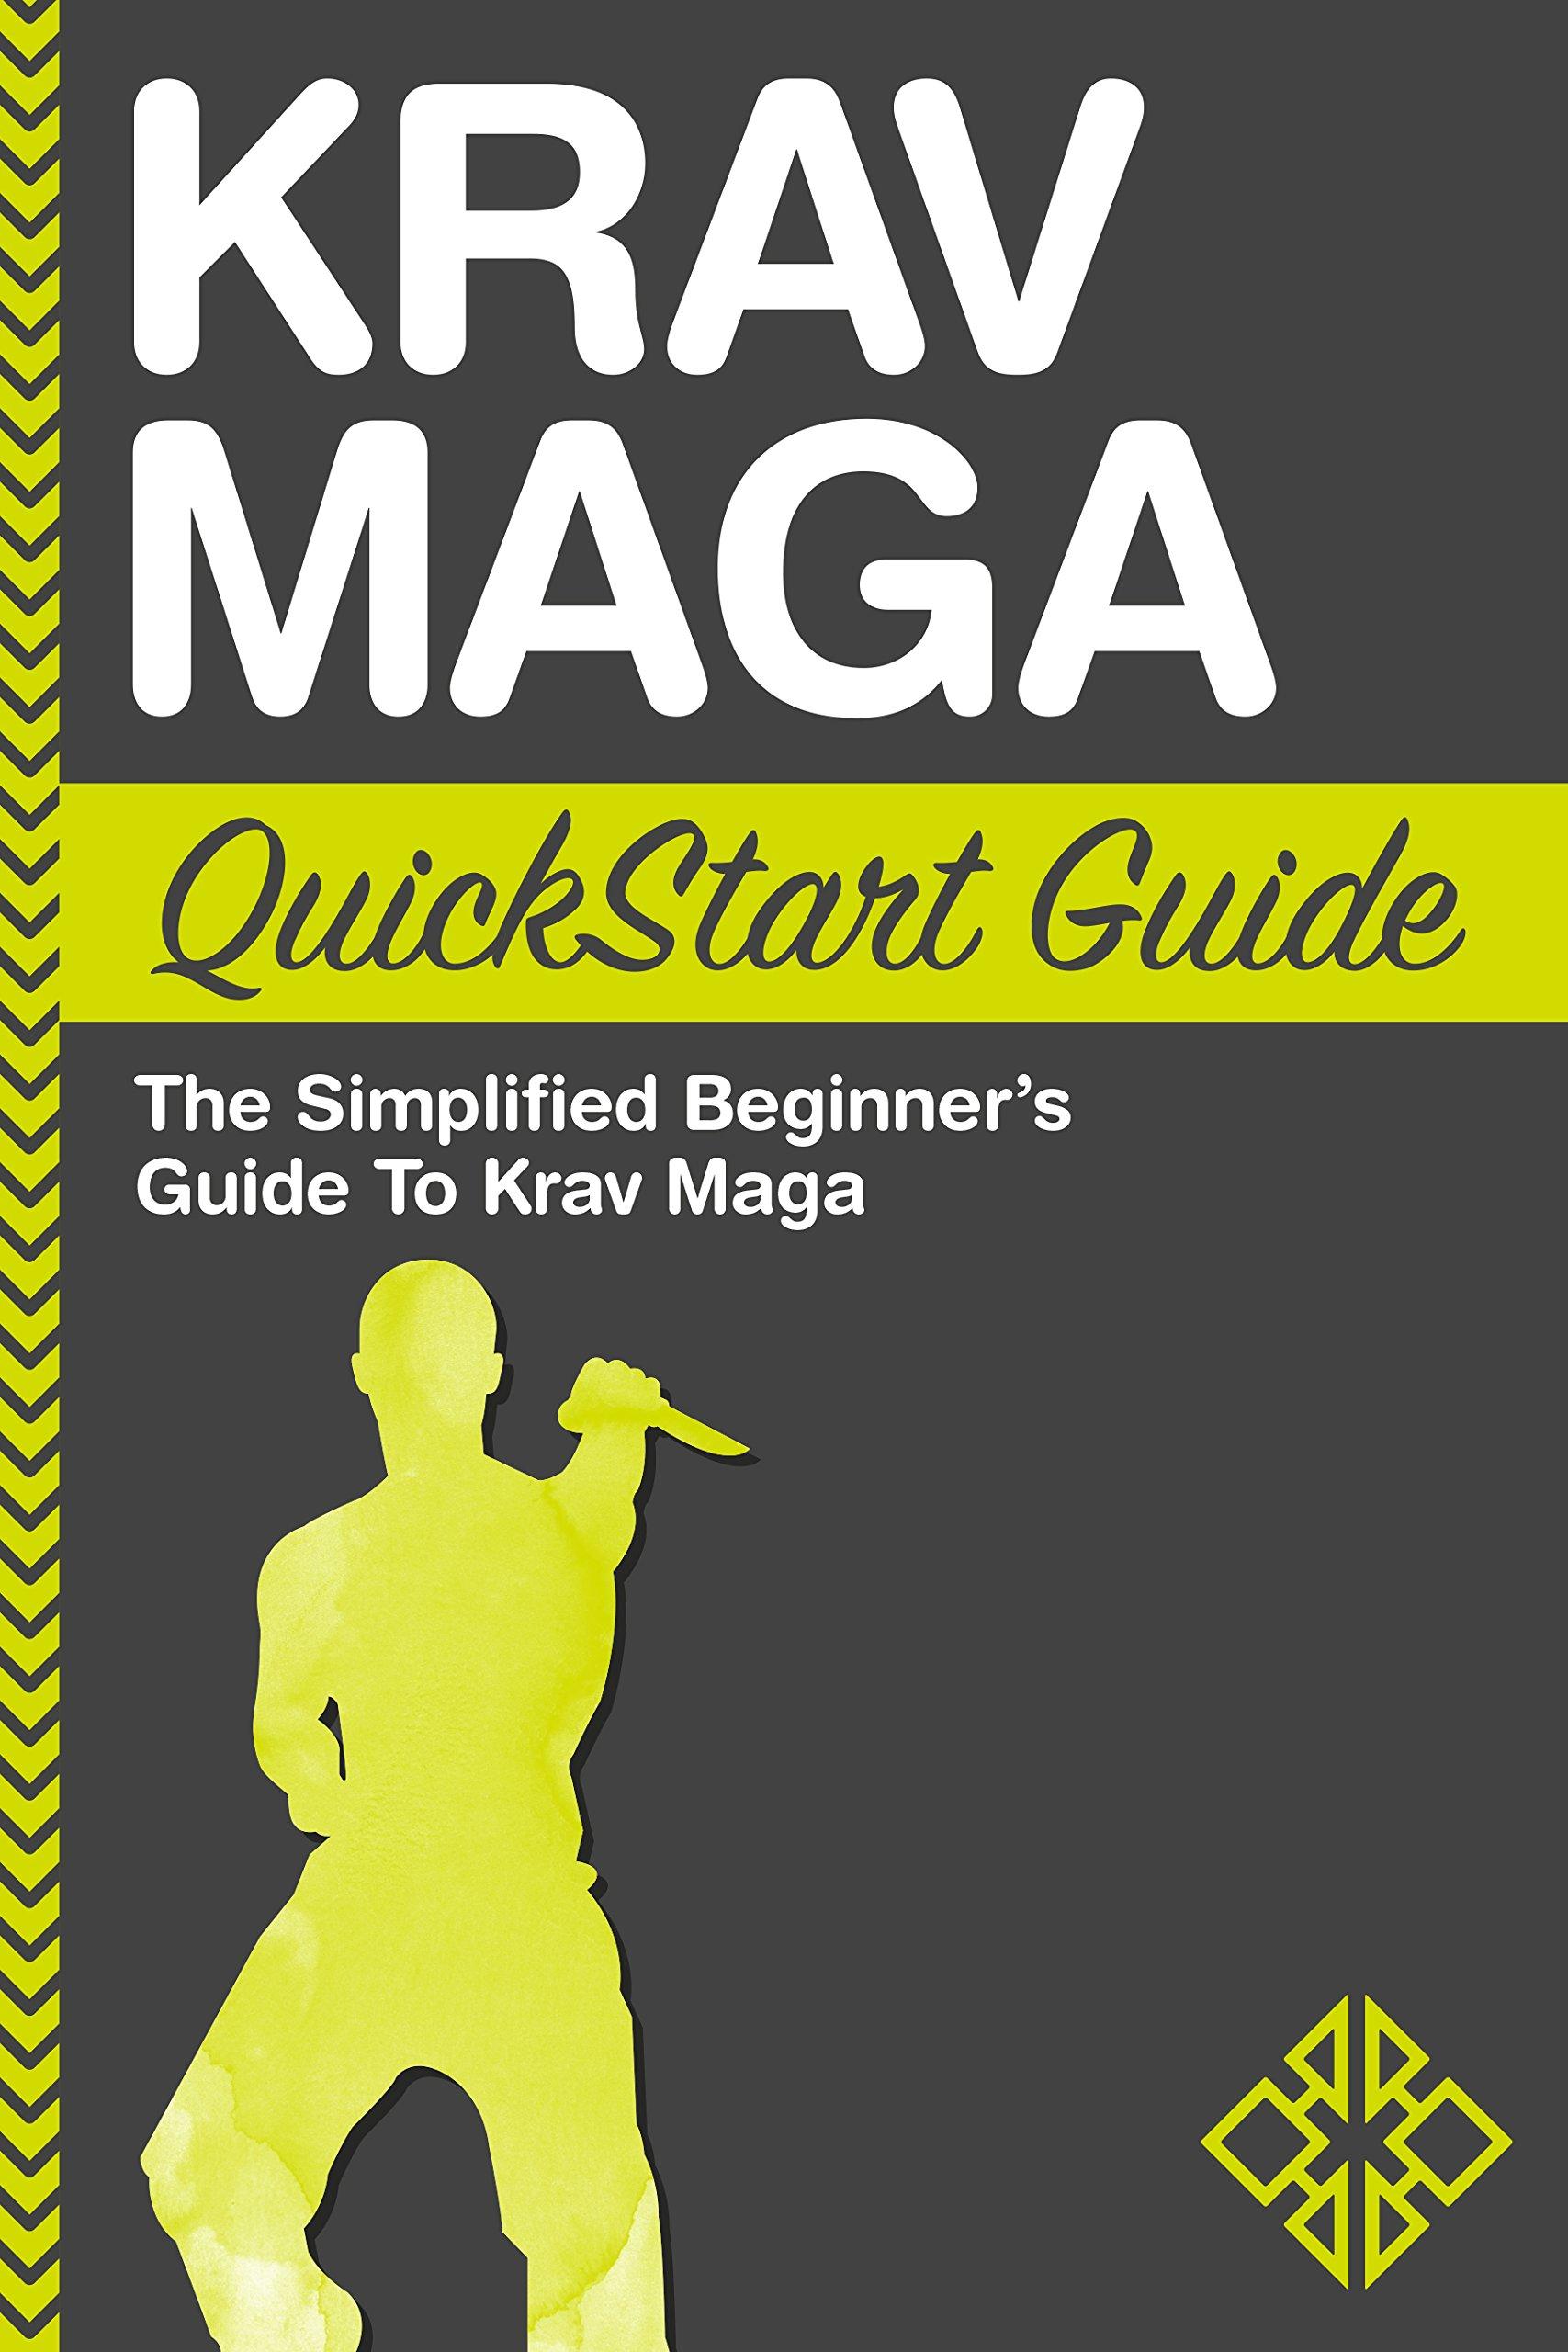 Krav Maga QuickStart Guide  The Simplified Beginner's Guide To Krav Maga  English Edition